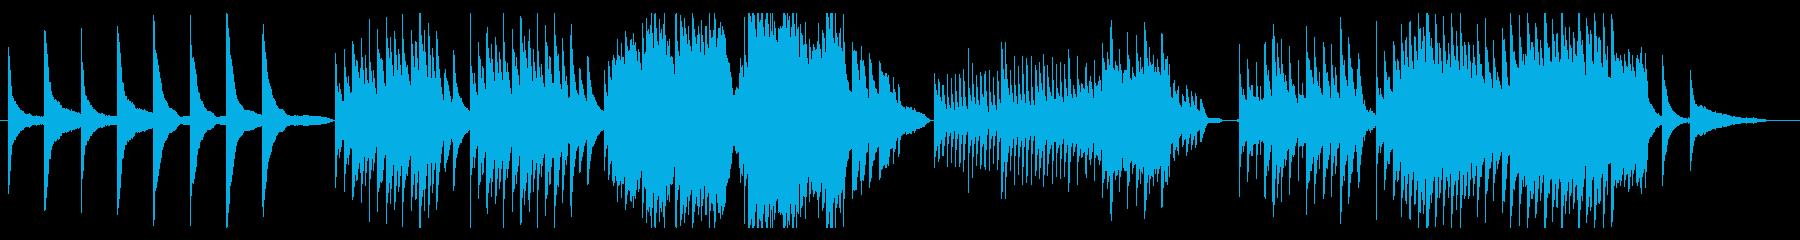 [Drama accompaniment] Quiet piano piece for sad scenes's reproduced waveform